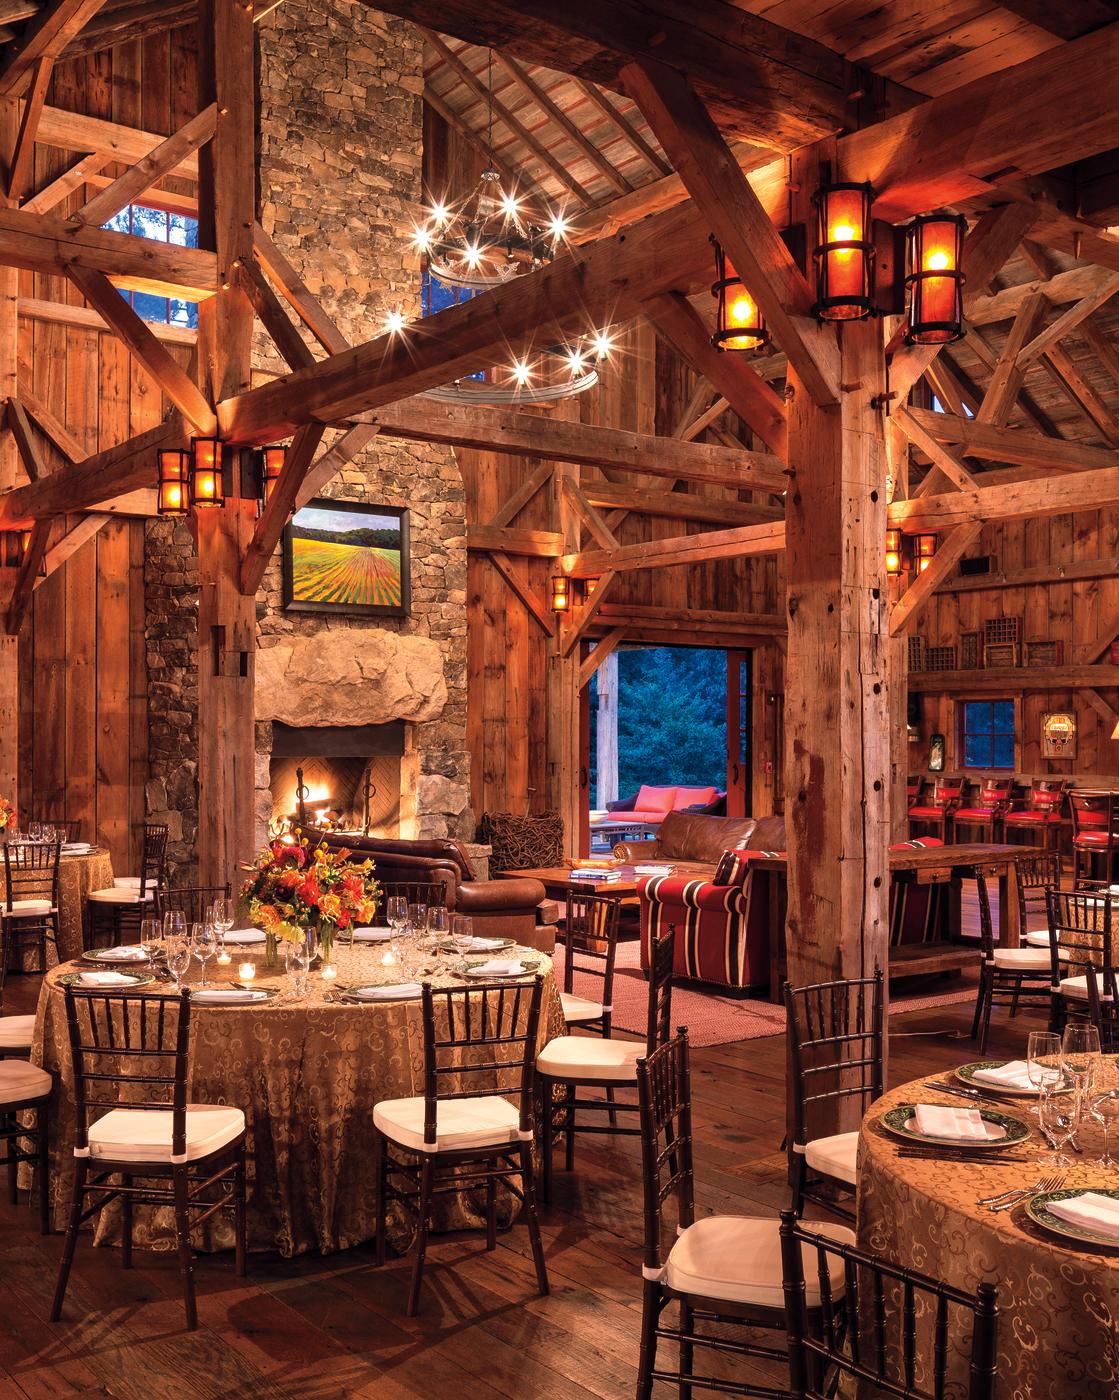 celebrity-wedding-venues-ritz-carlton-lodge-sandy-creek-barn-1015.jpg